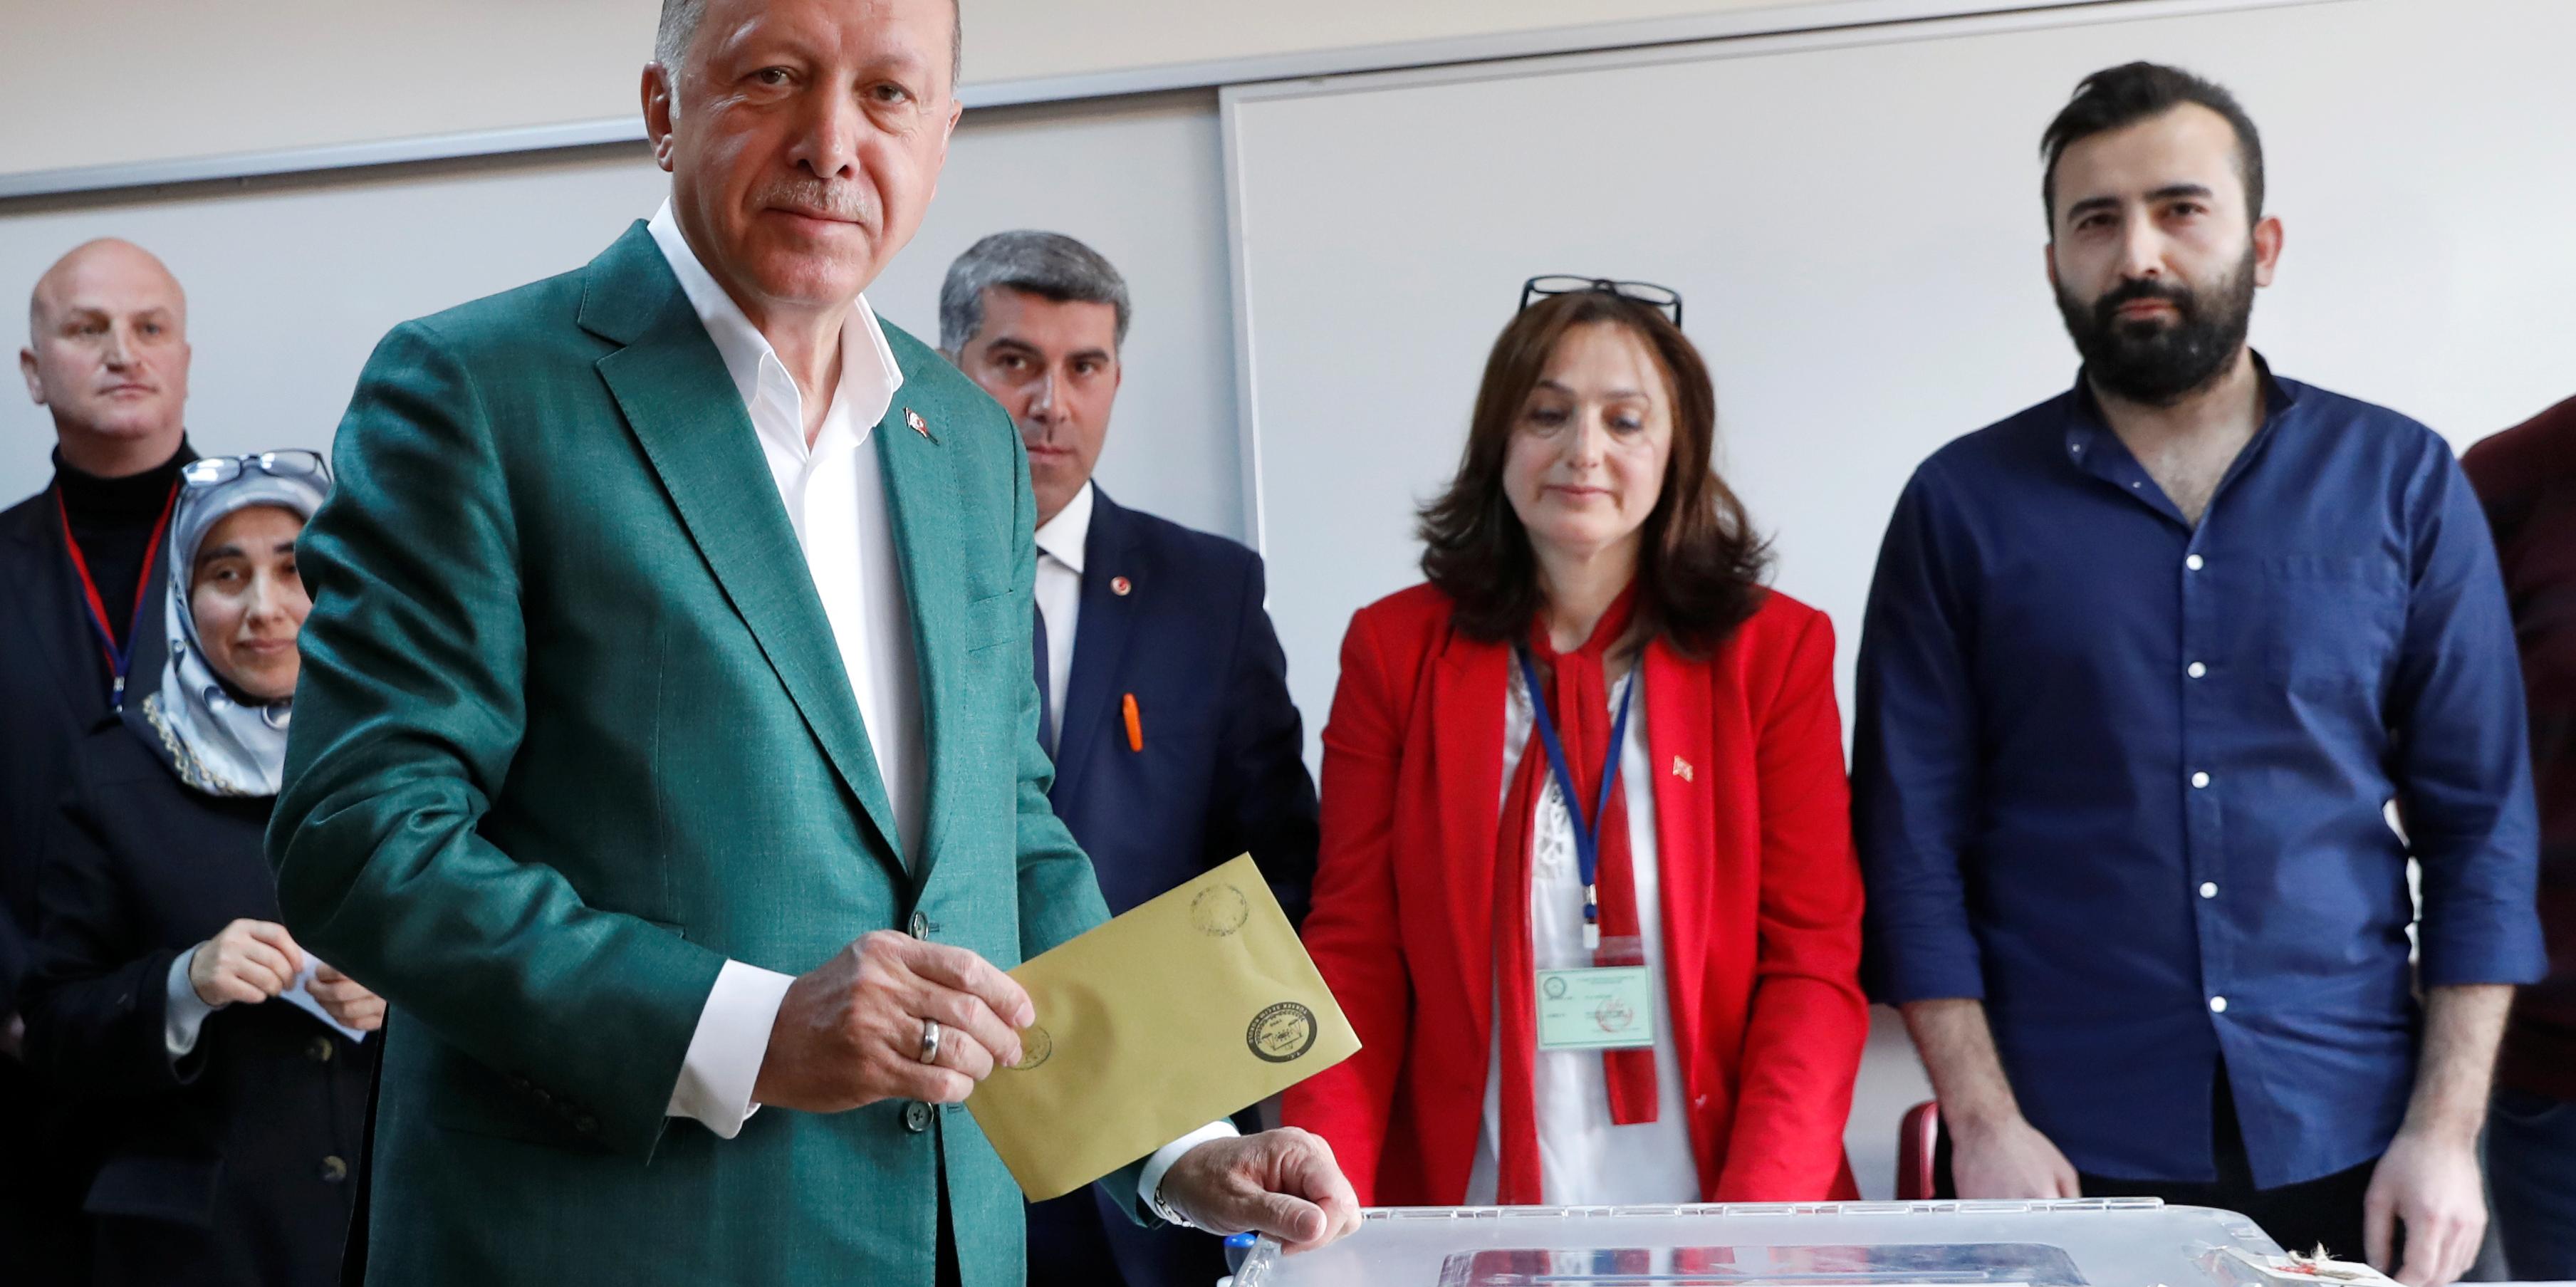 erdogan-election-istanbul-nouveau-vote-opposition-imamoglu